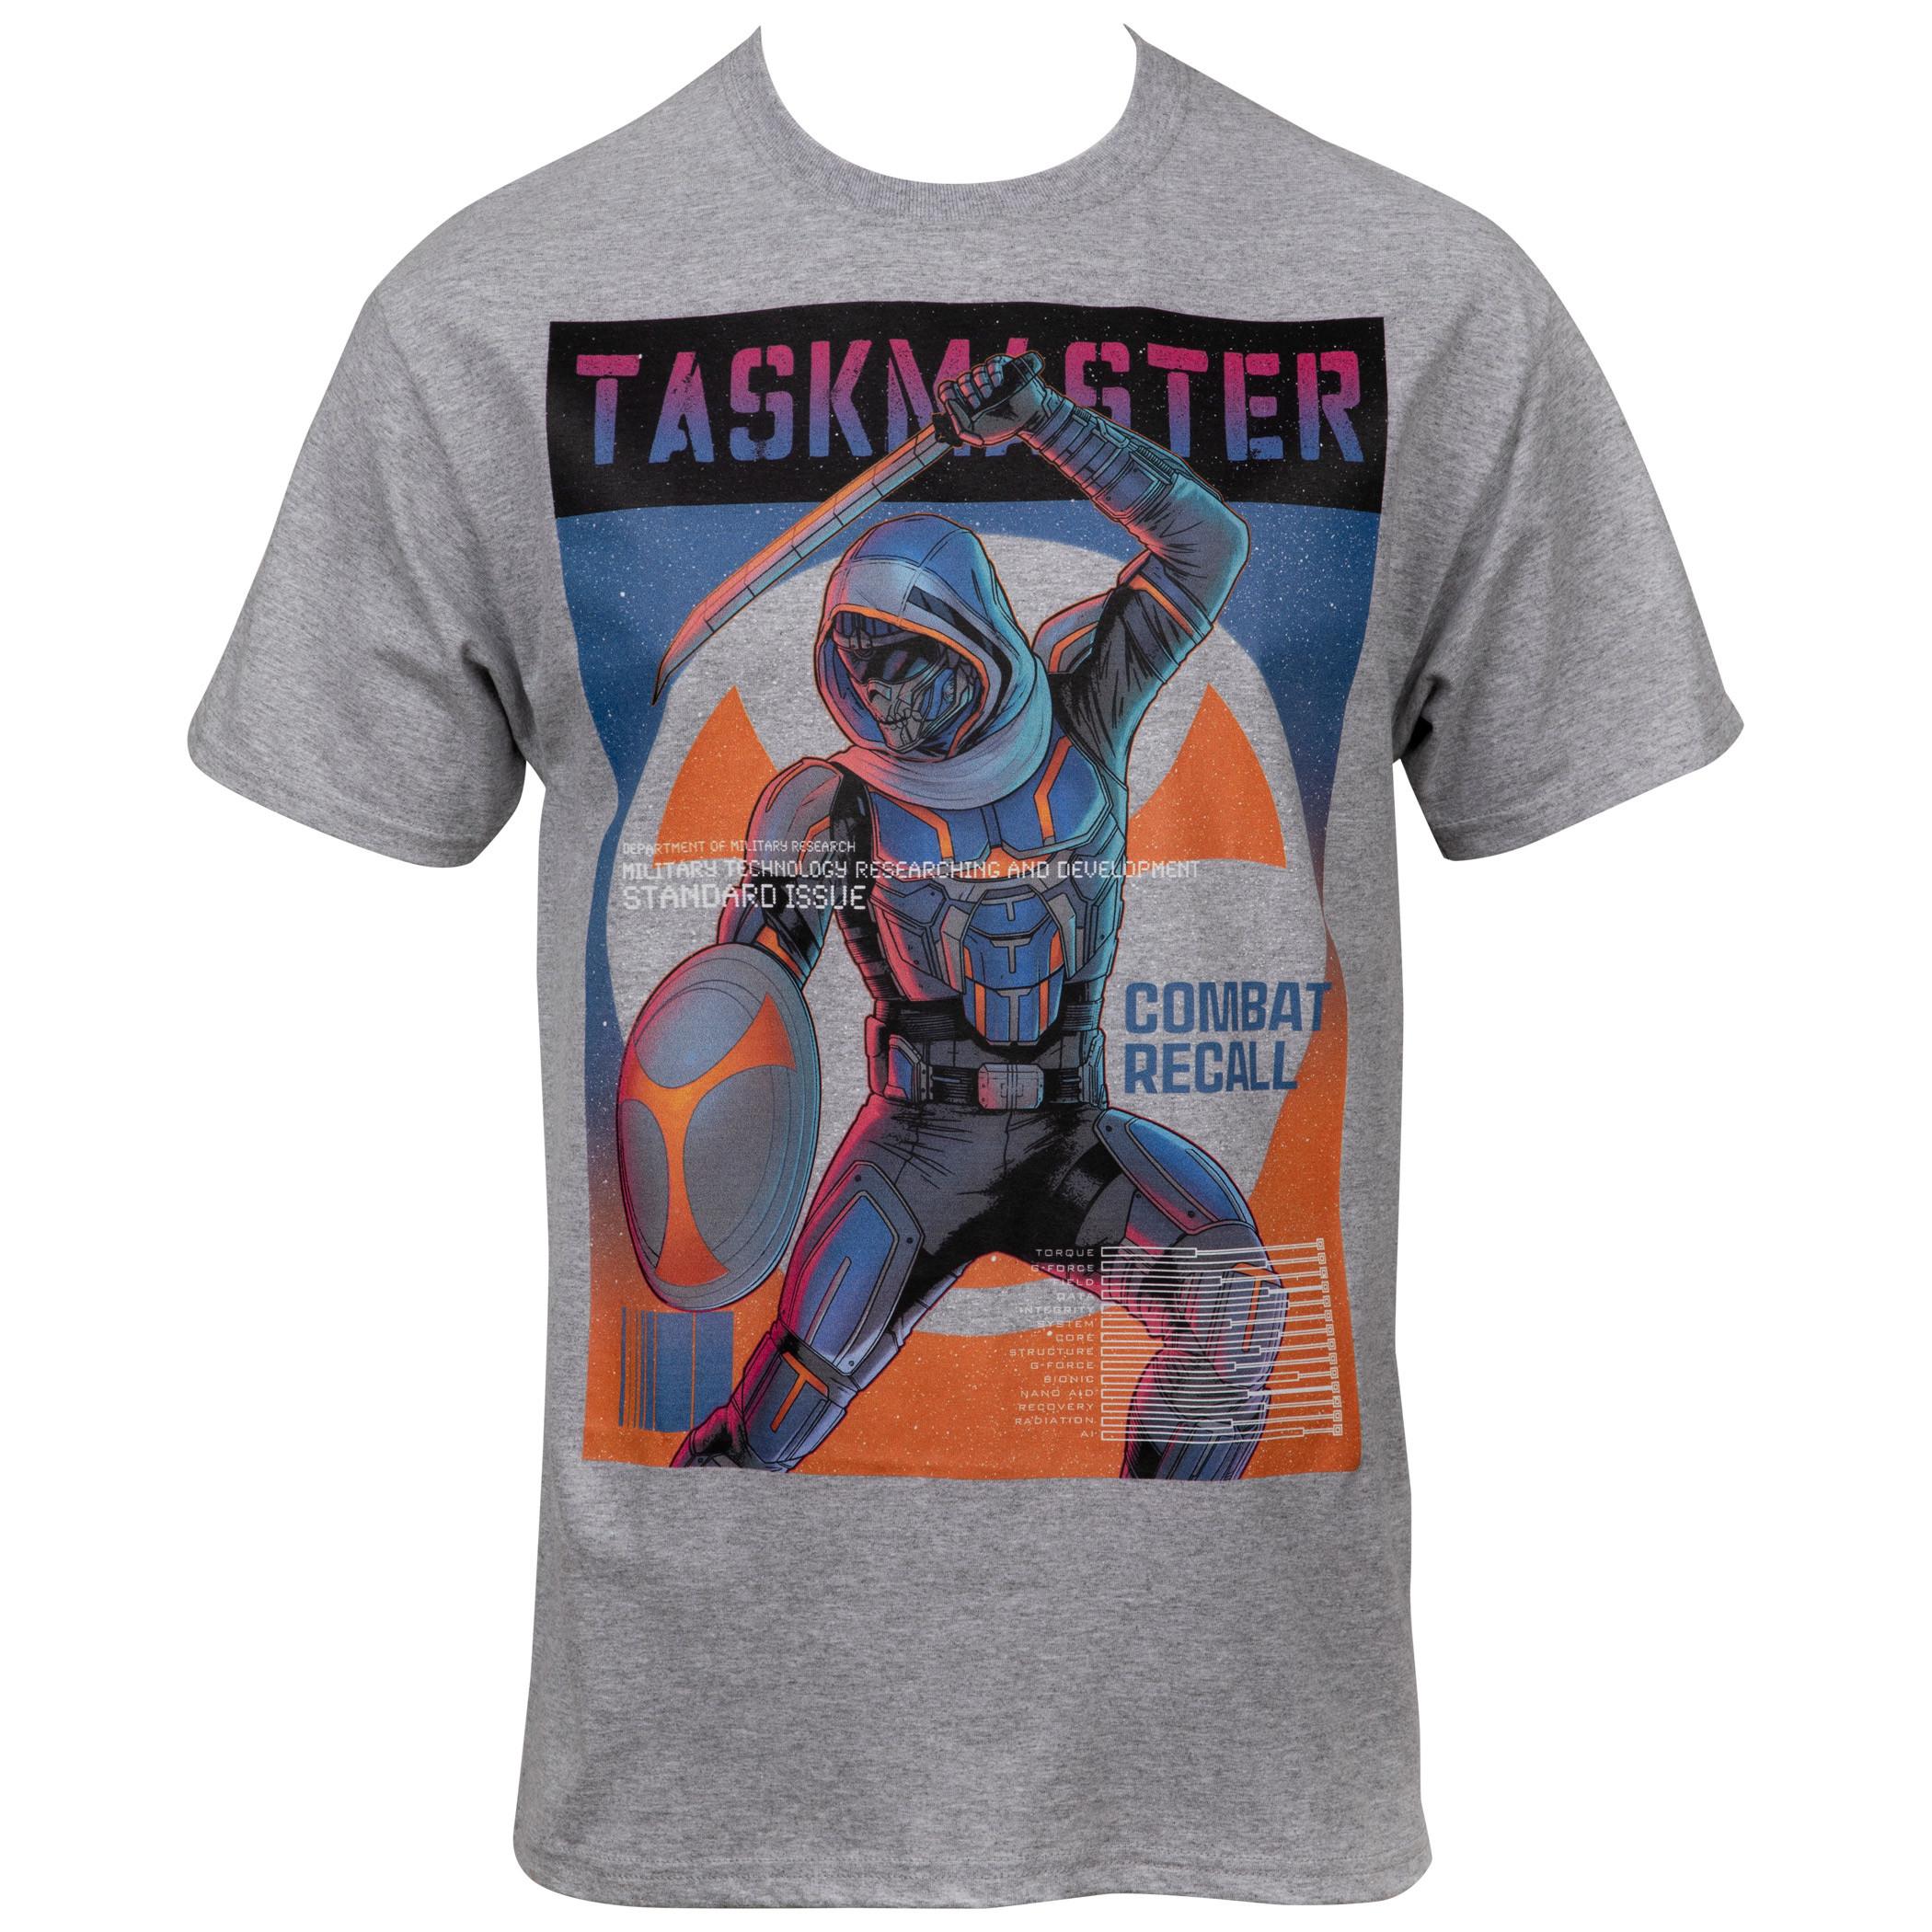 Black Widow movie Taskmaster Combat Recall T-Shirt